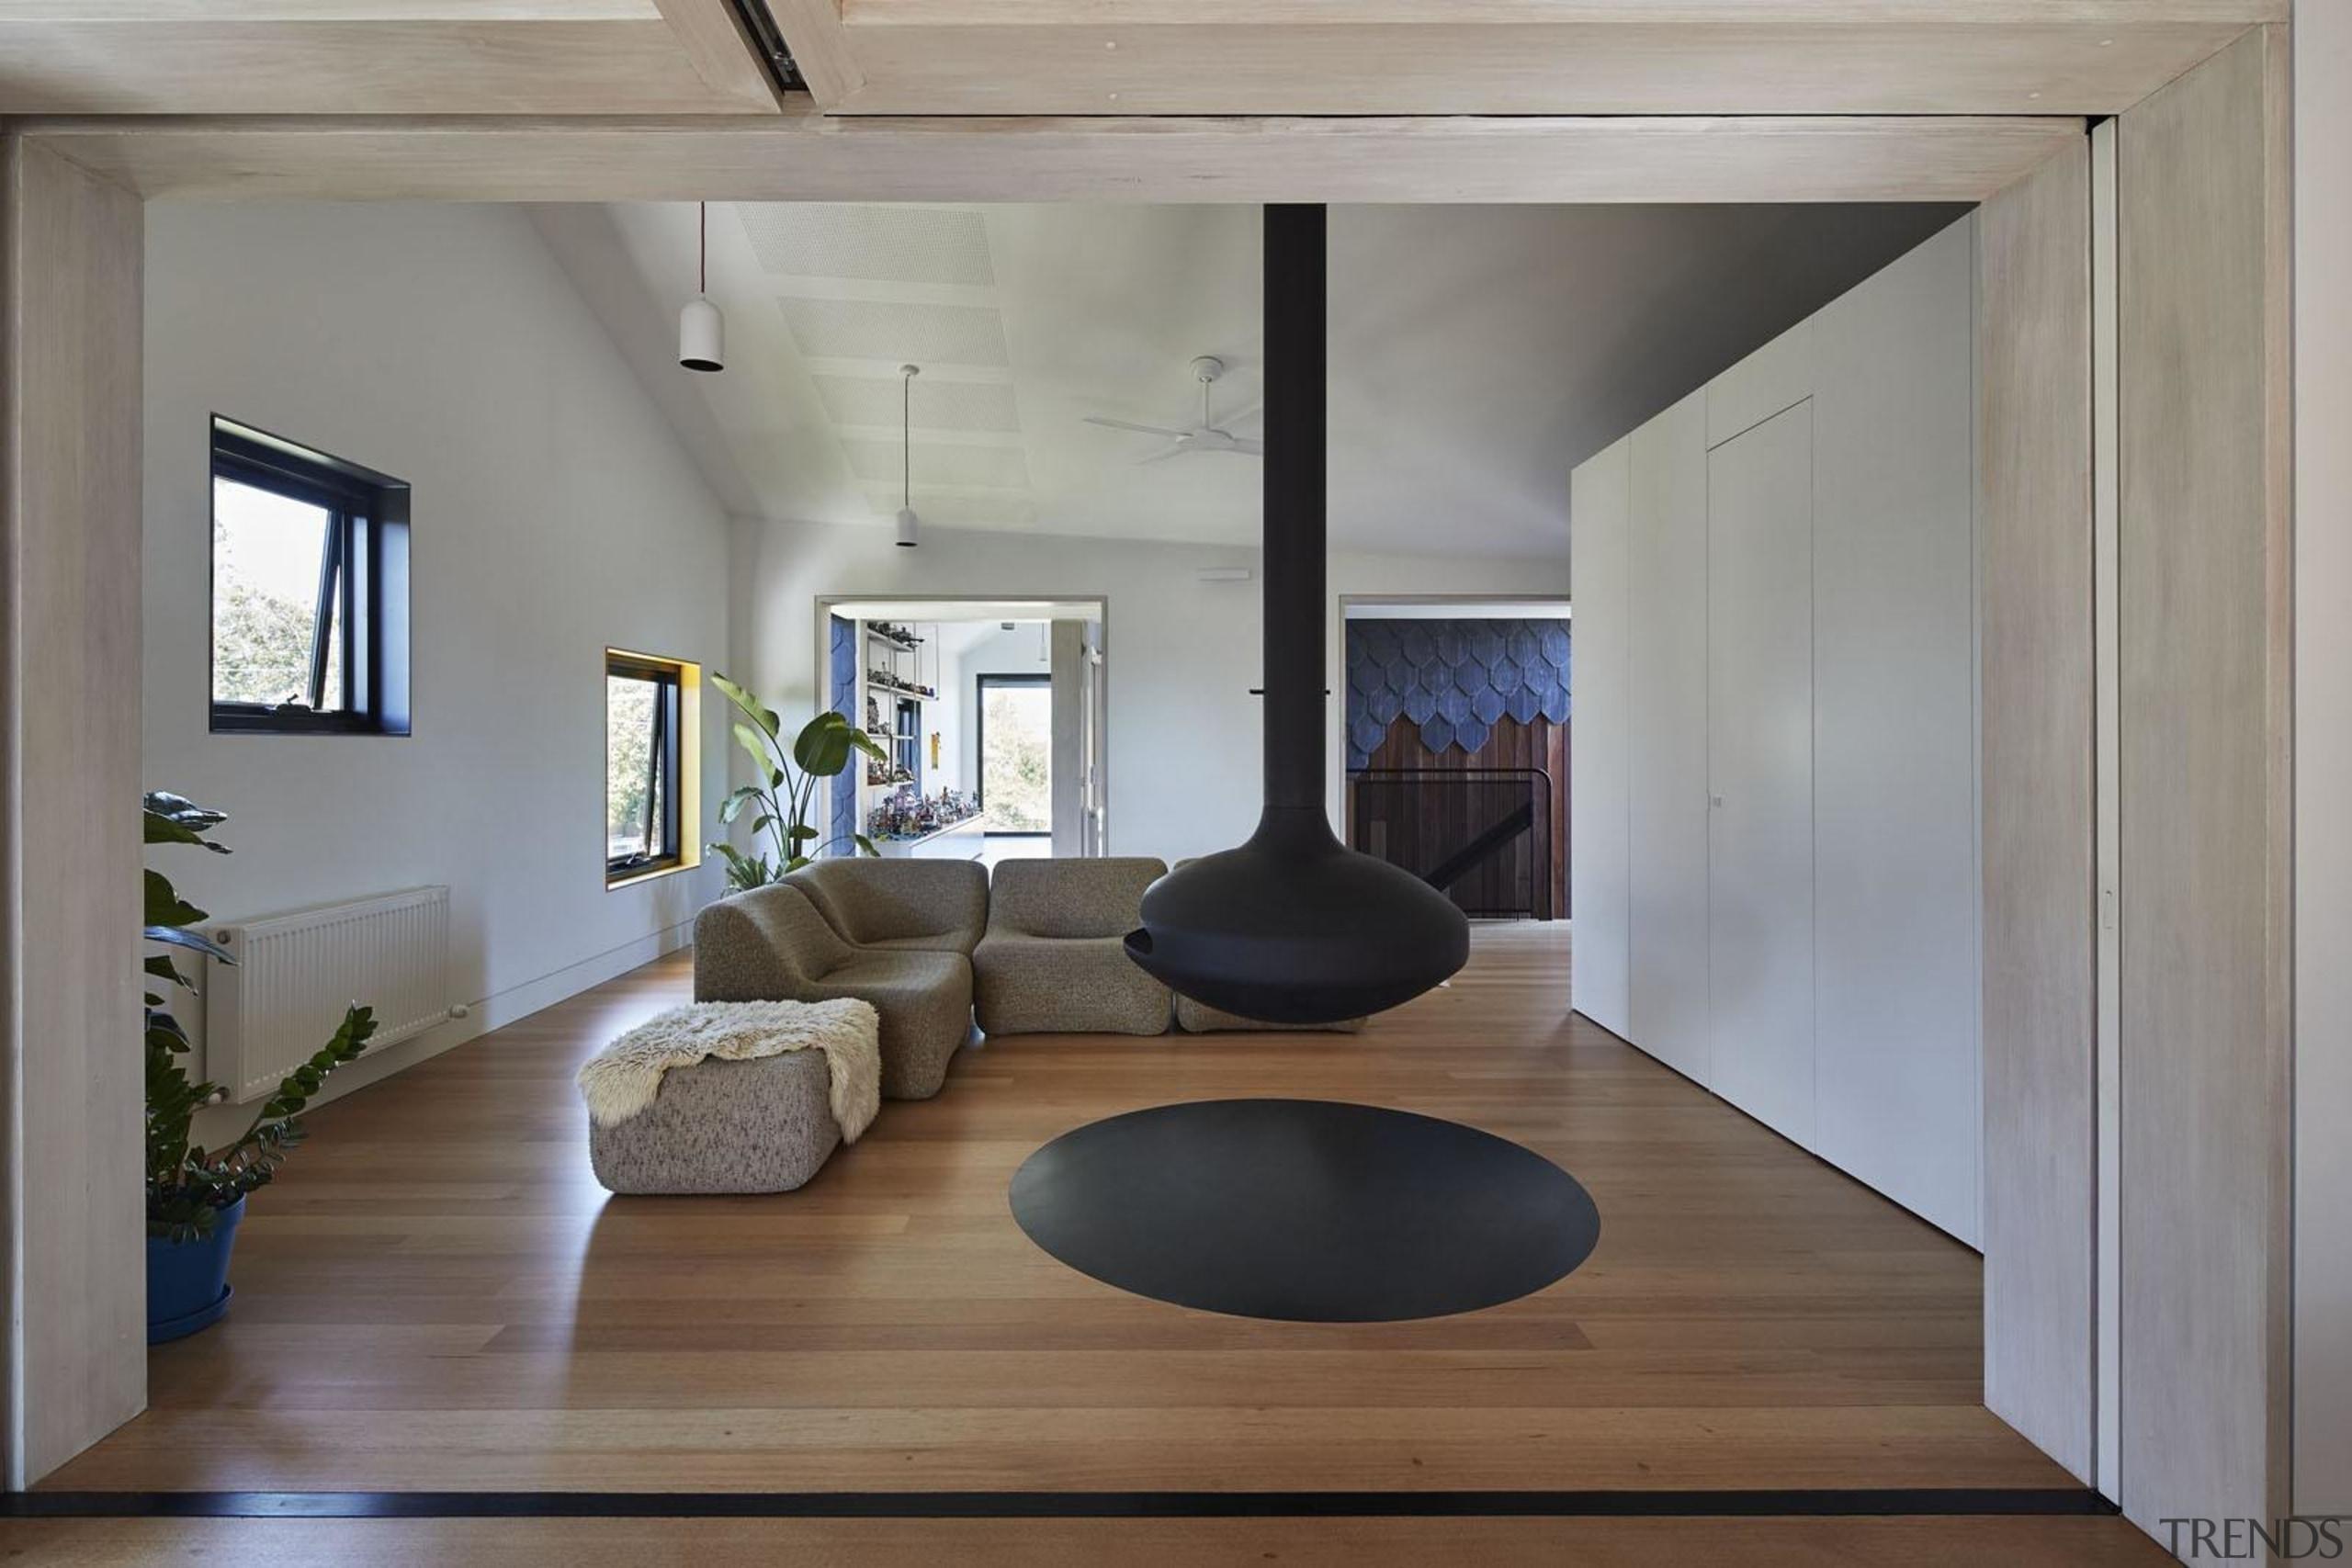 Architect: Austin Maynard ArchitectsPhotography by Peter Bennetts architecture, ceiling, floor, flooring, hardwood, house, interior design, living room, loft, wood flooring, gray